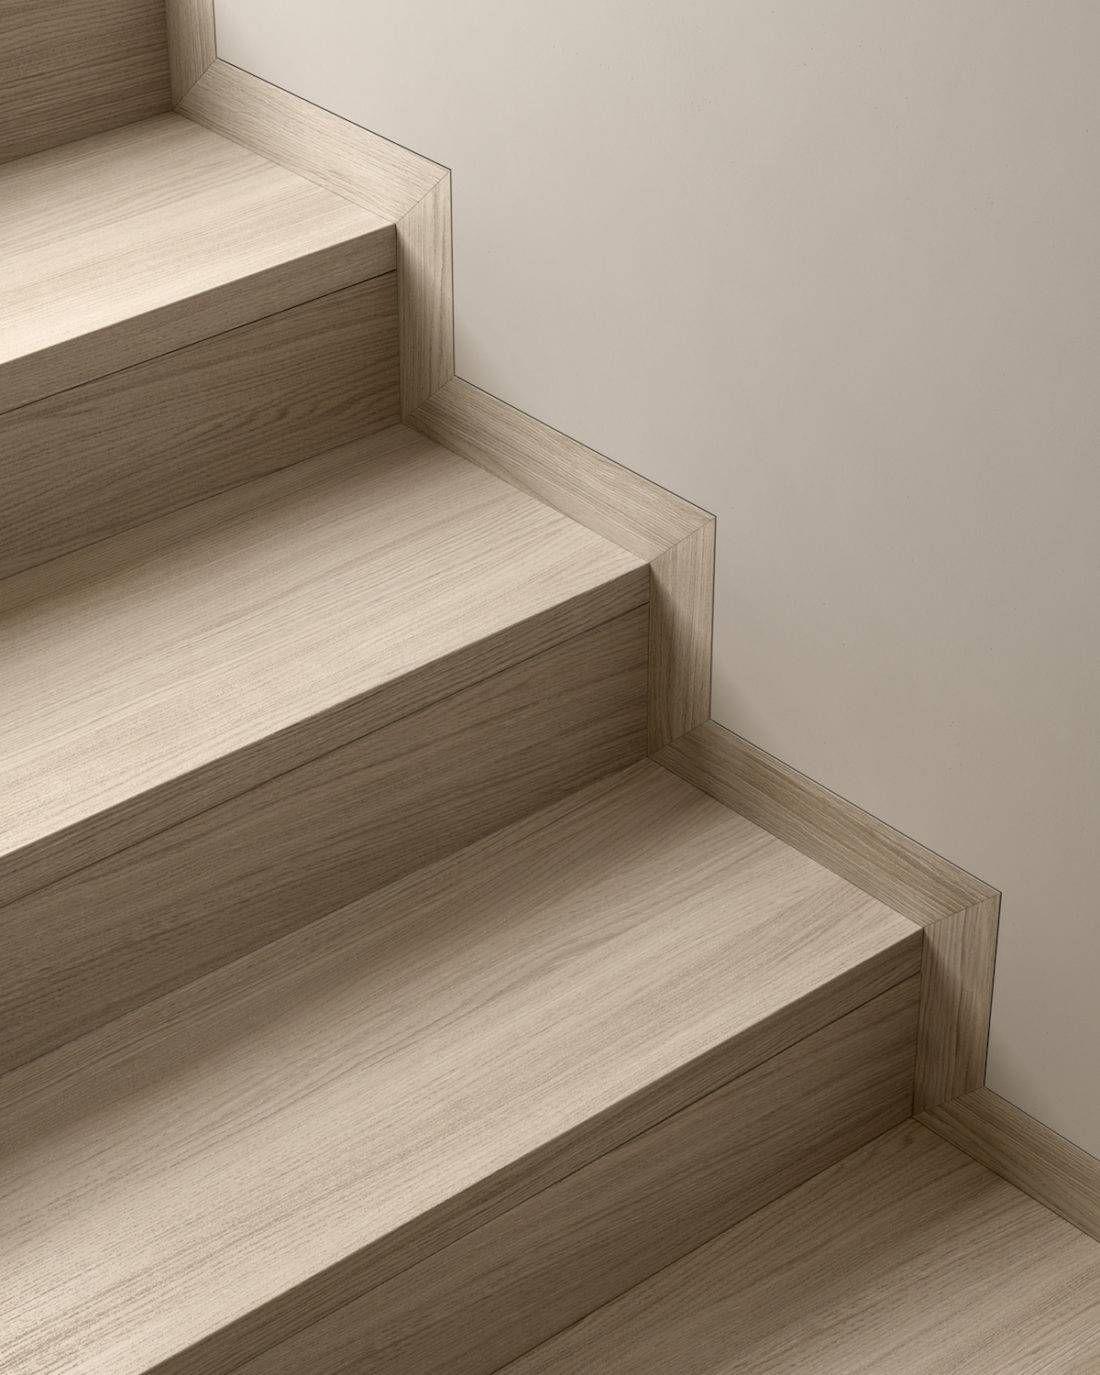 Recouvrir Un Escalier En Béton Épinglé sur home decor